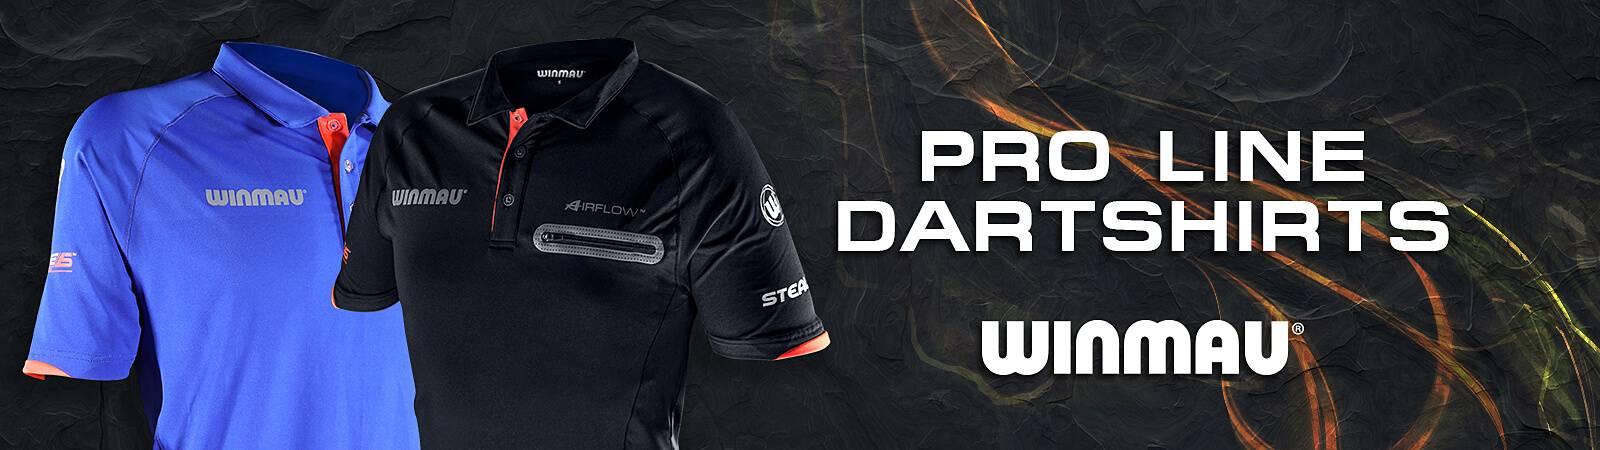 Winmau Pro Line Dartshirts